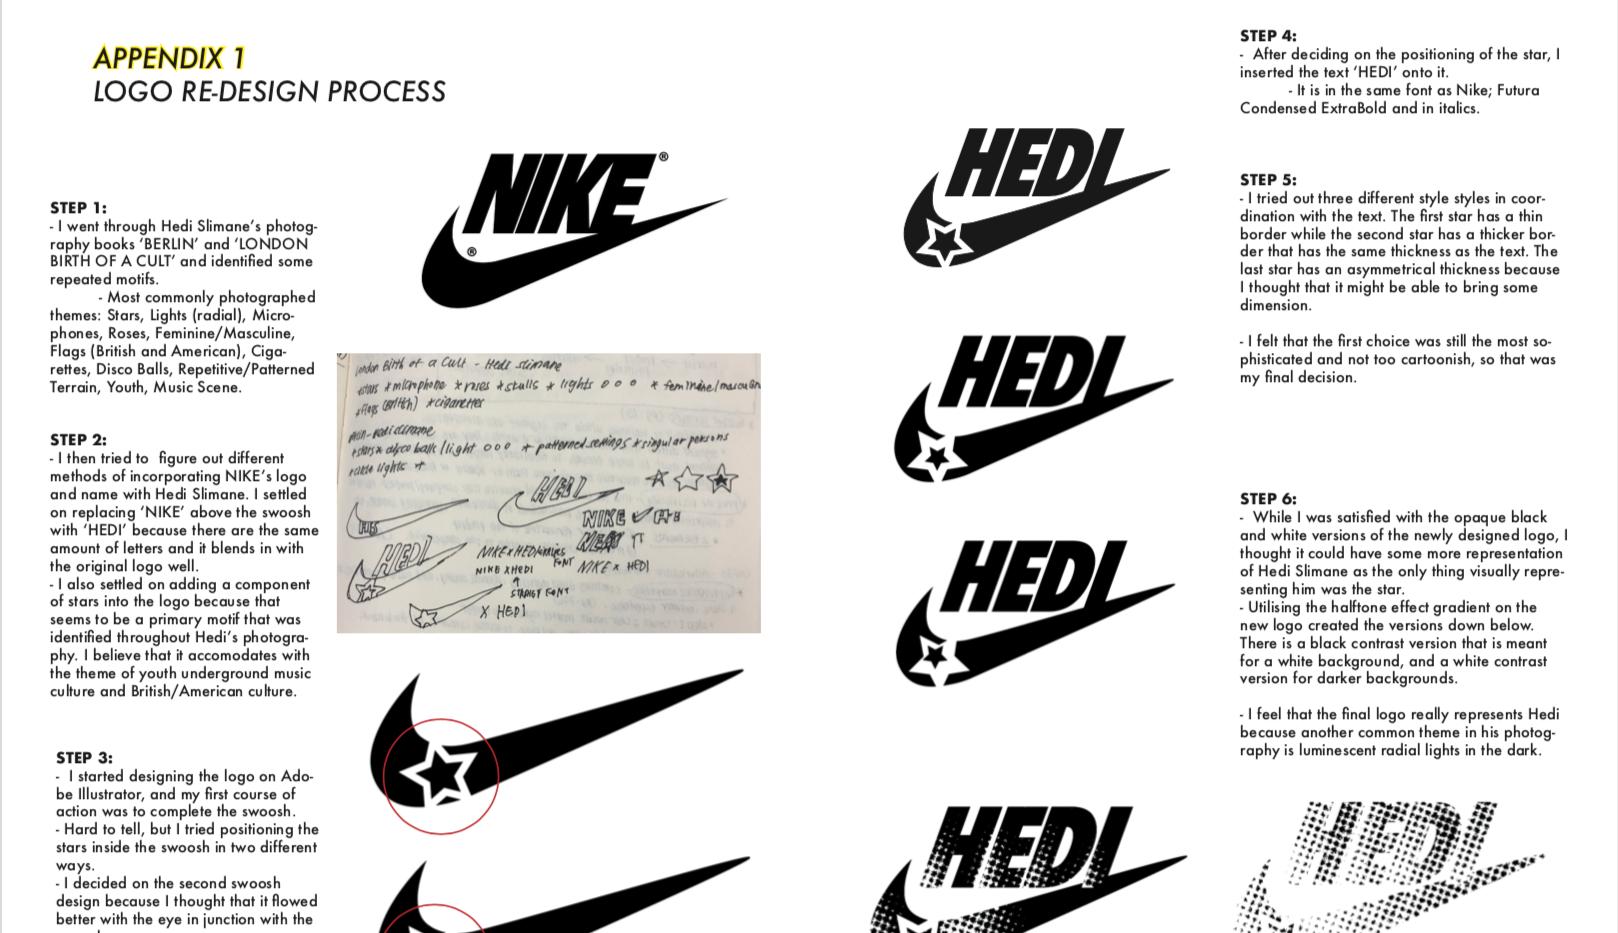 Appendix 1: Logo Redesign Process